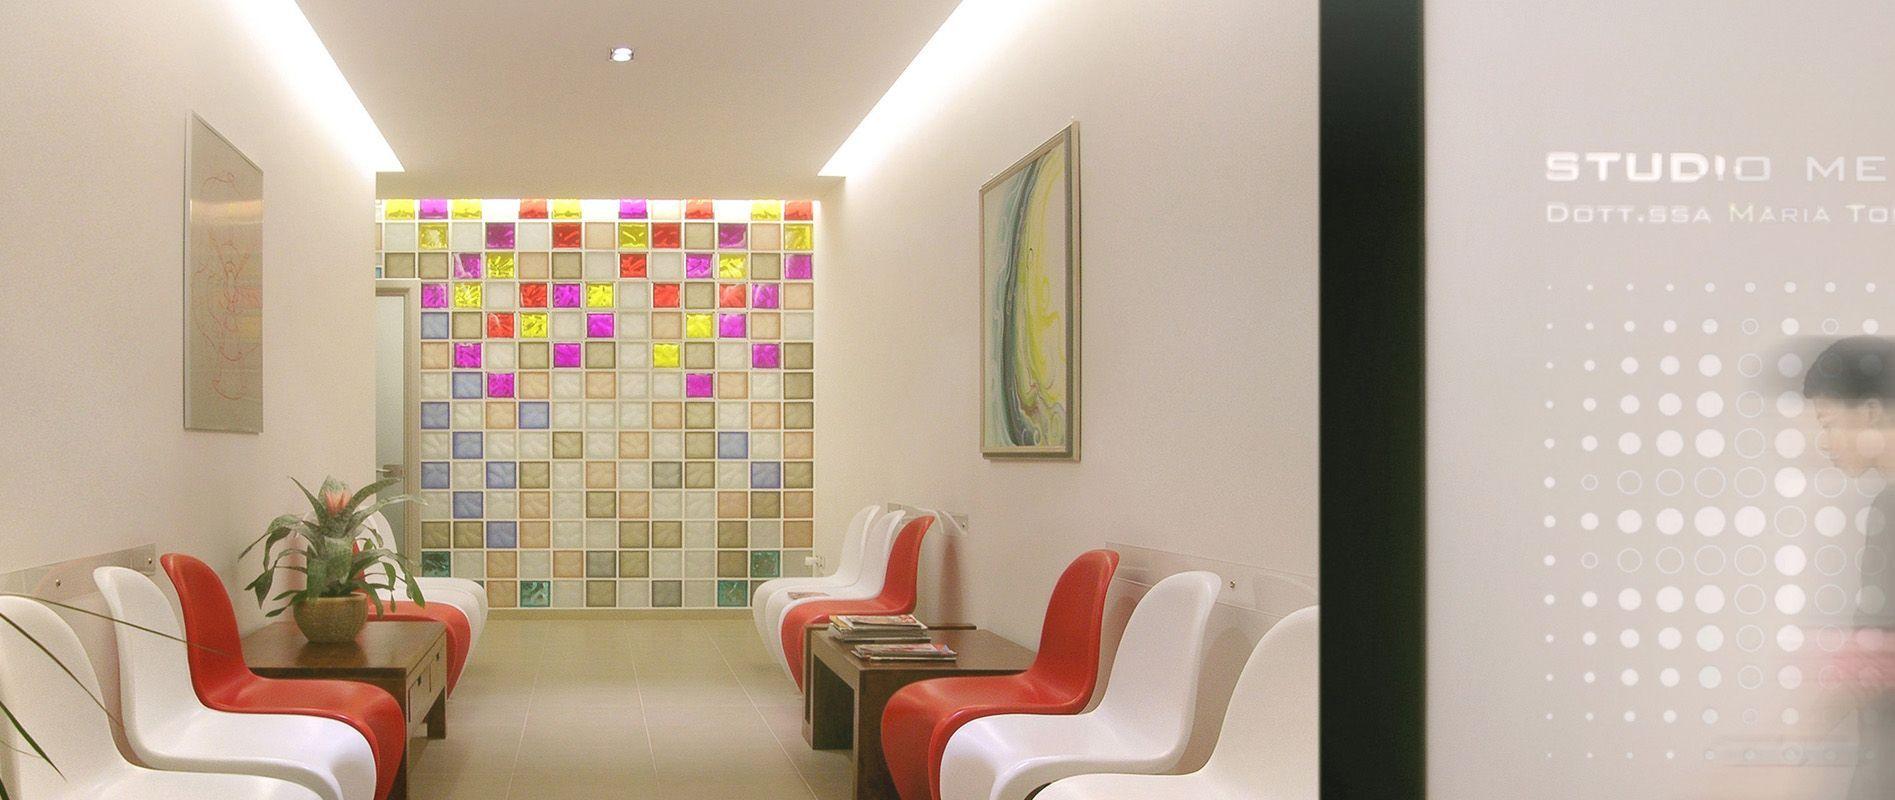 doctors office design. Doctors Office Interior Designs Colorful Design G